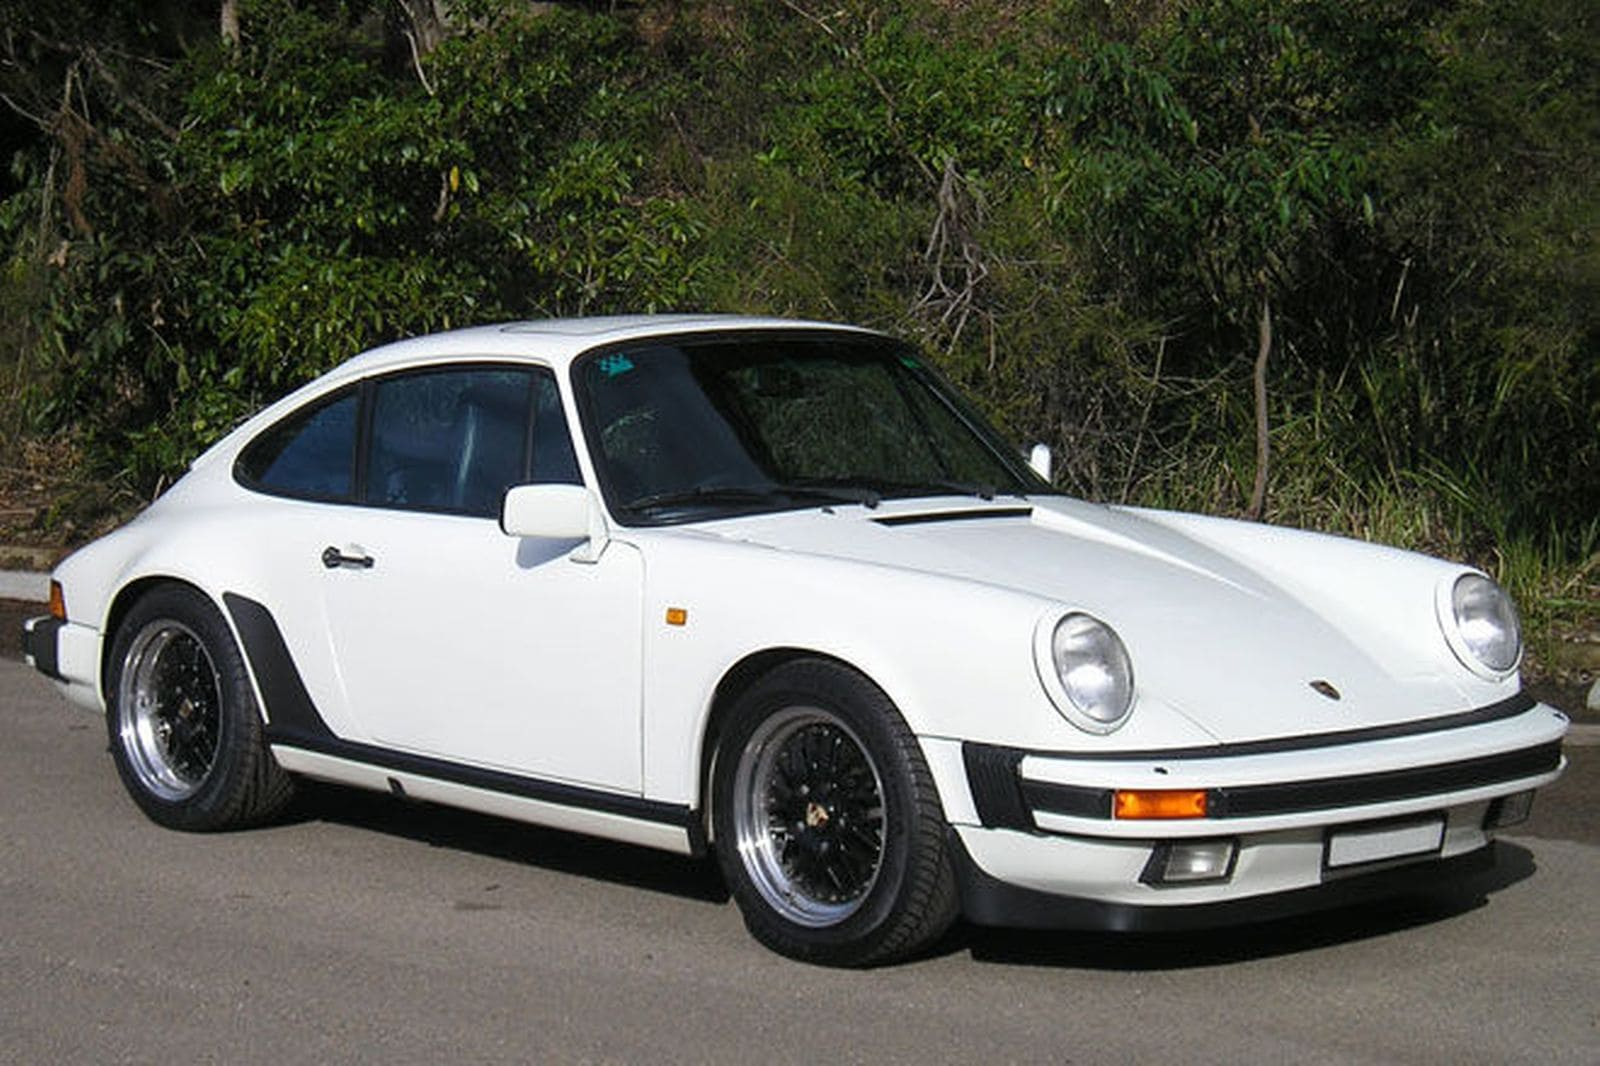 1985 Porsche 911 Carrera 32 Coupe | Photo Source: Shannons